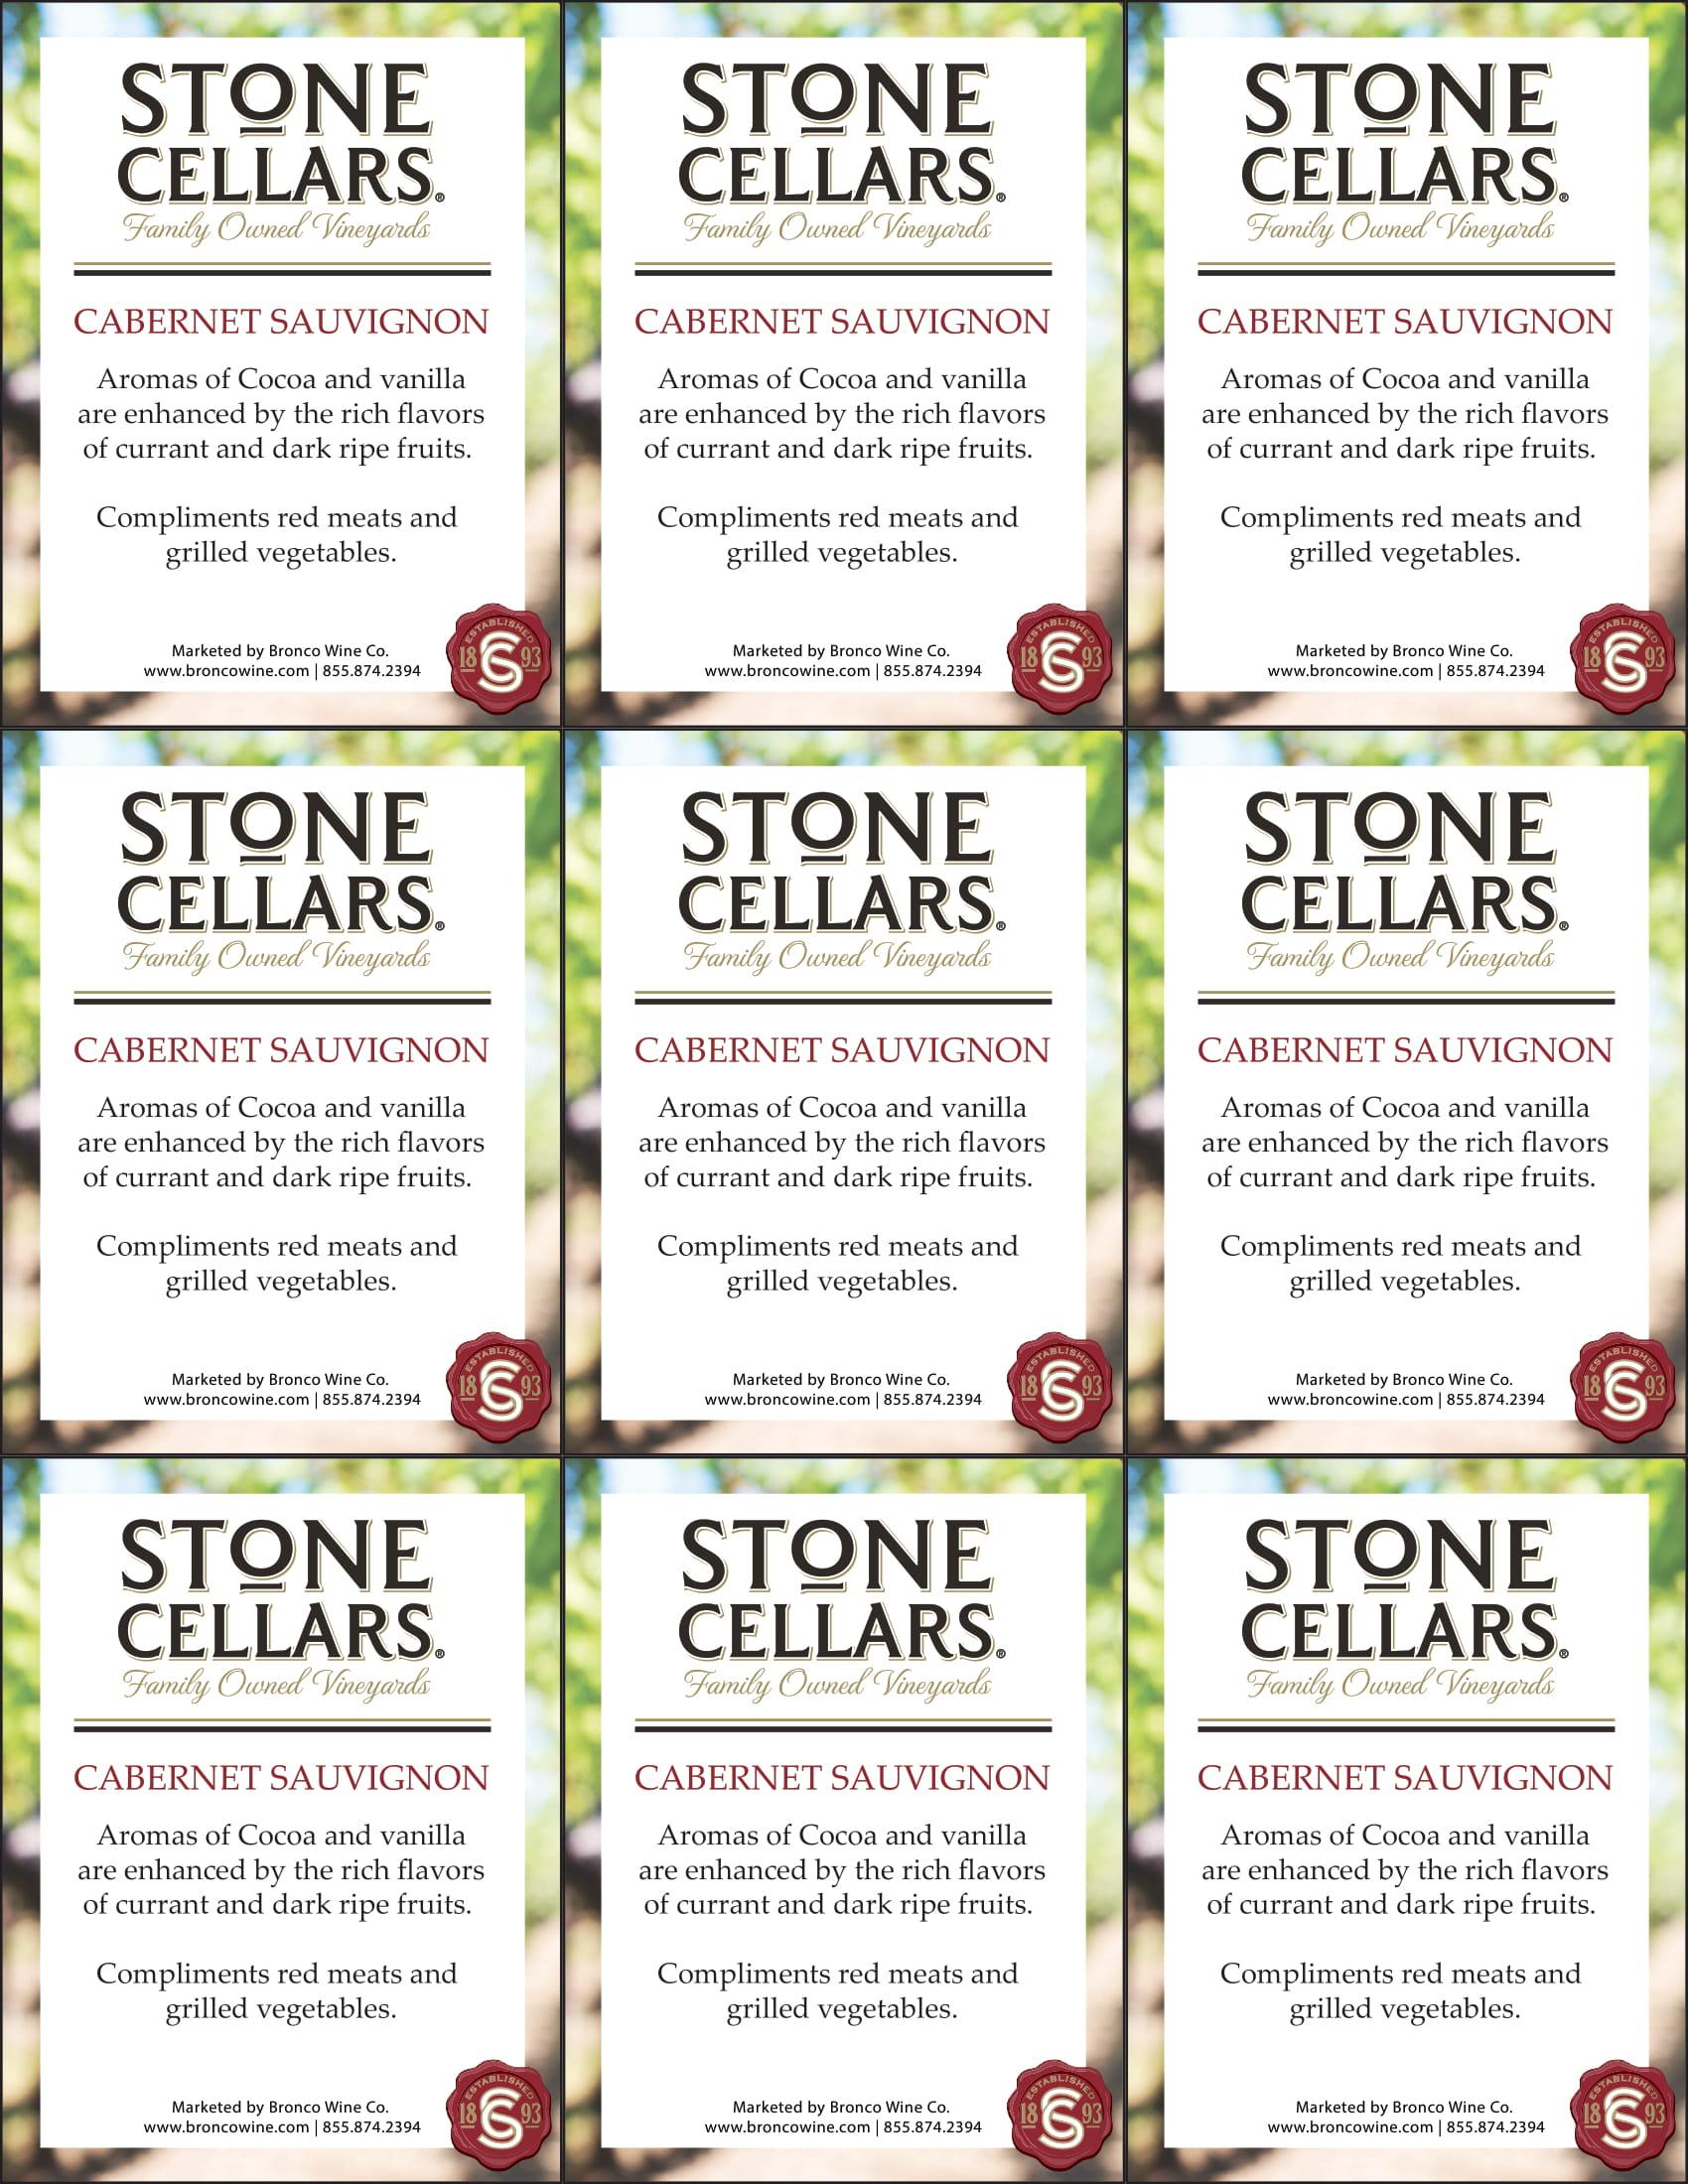 Stone Cellars Cabernet Sauvignon Shelf Talker